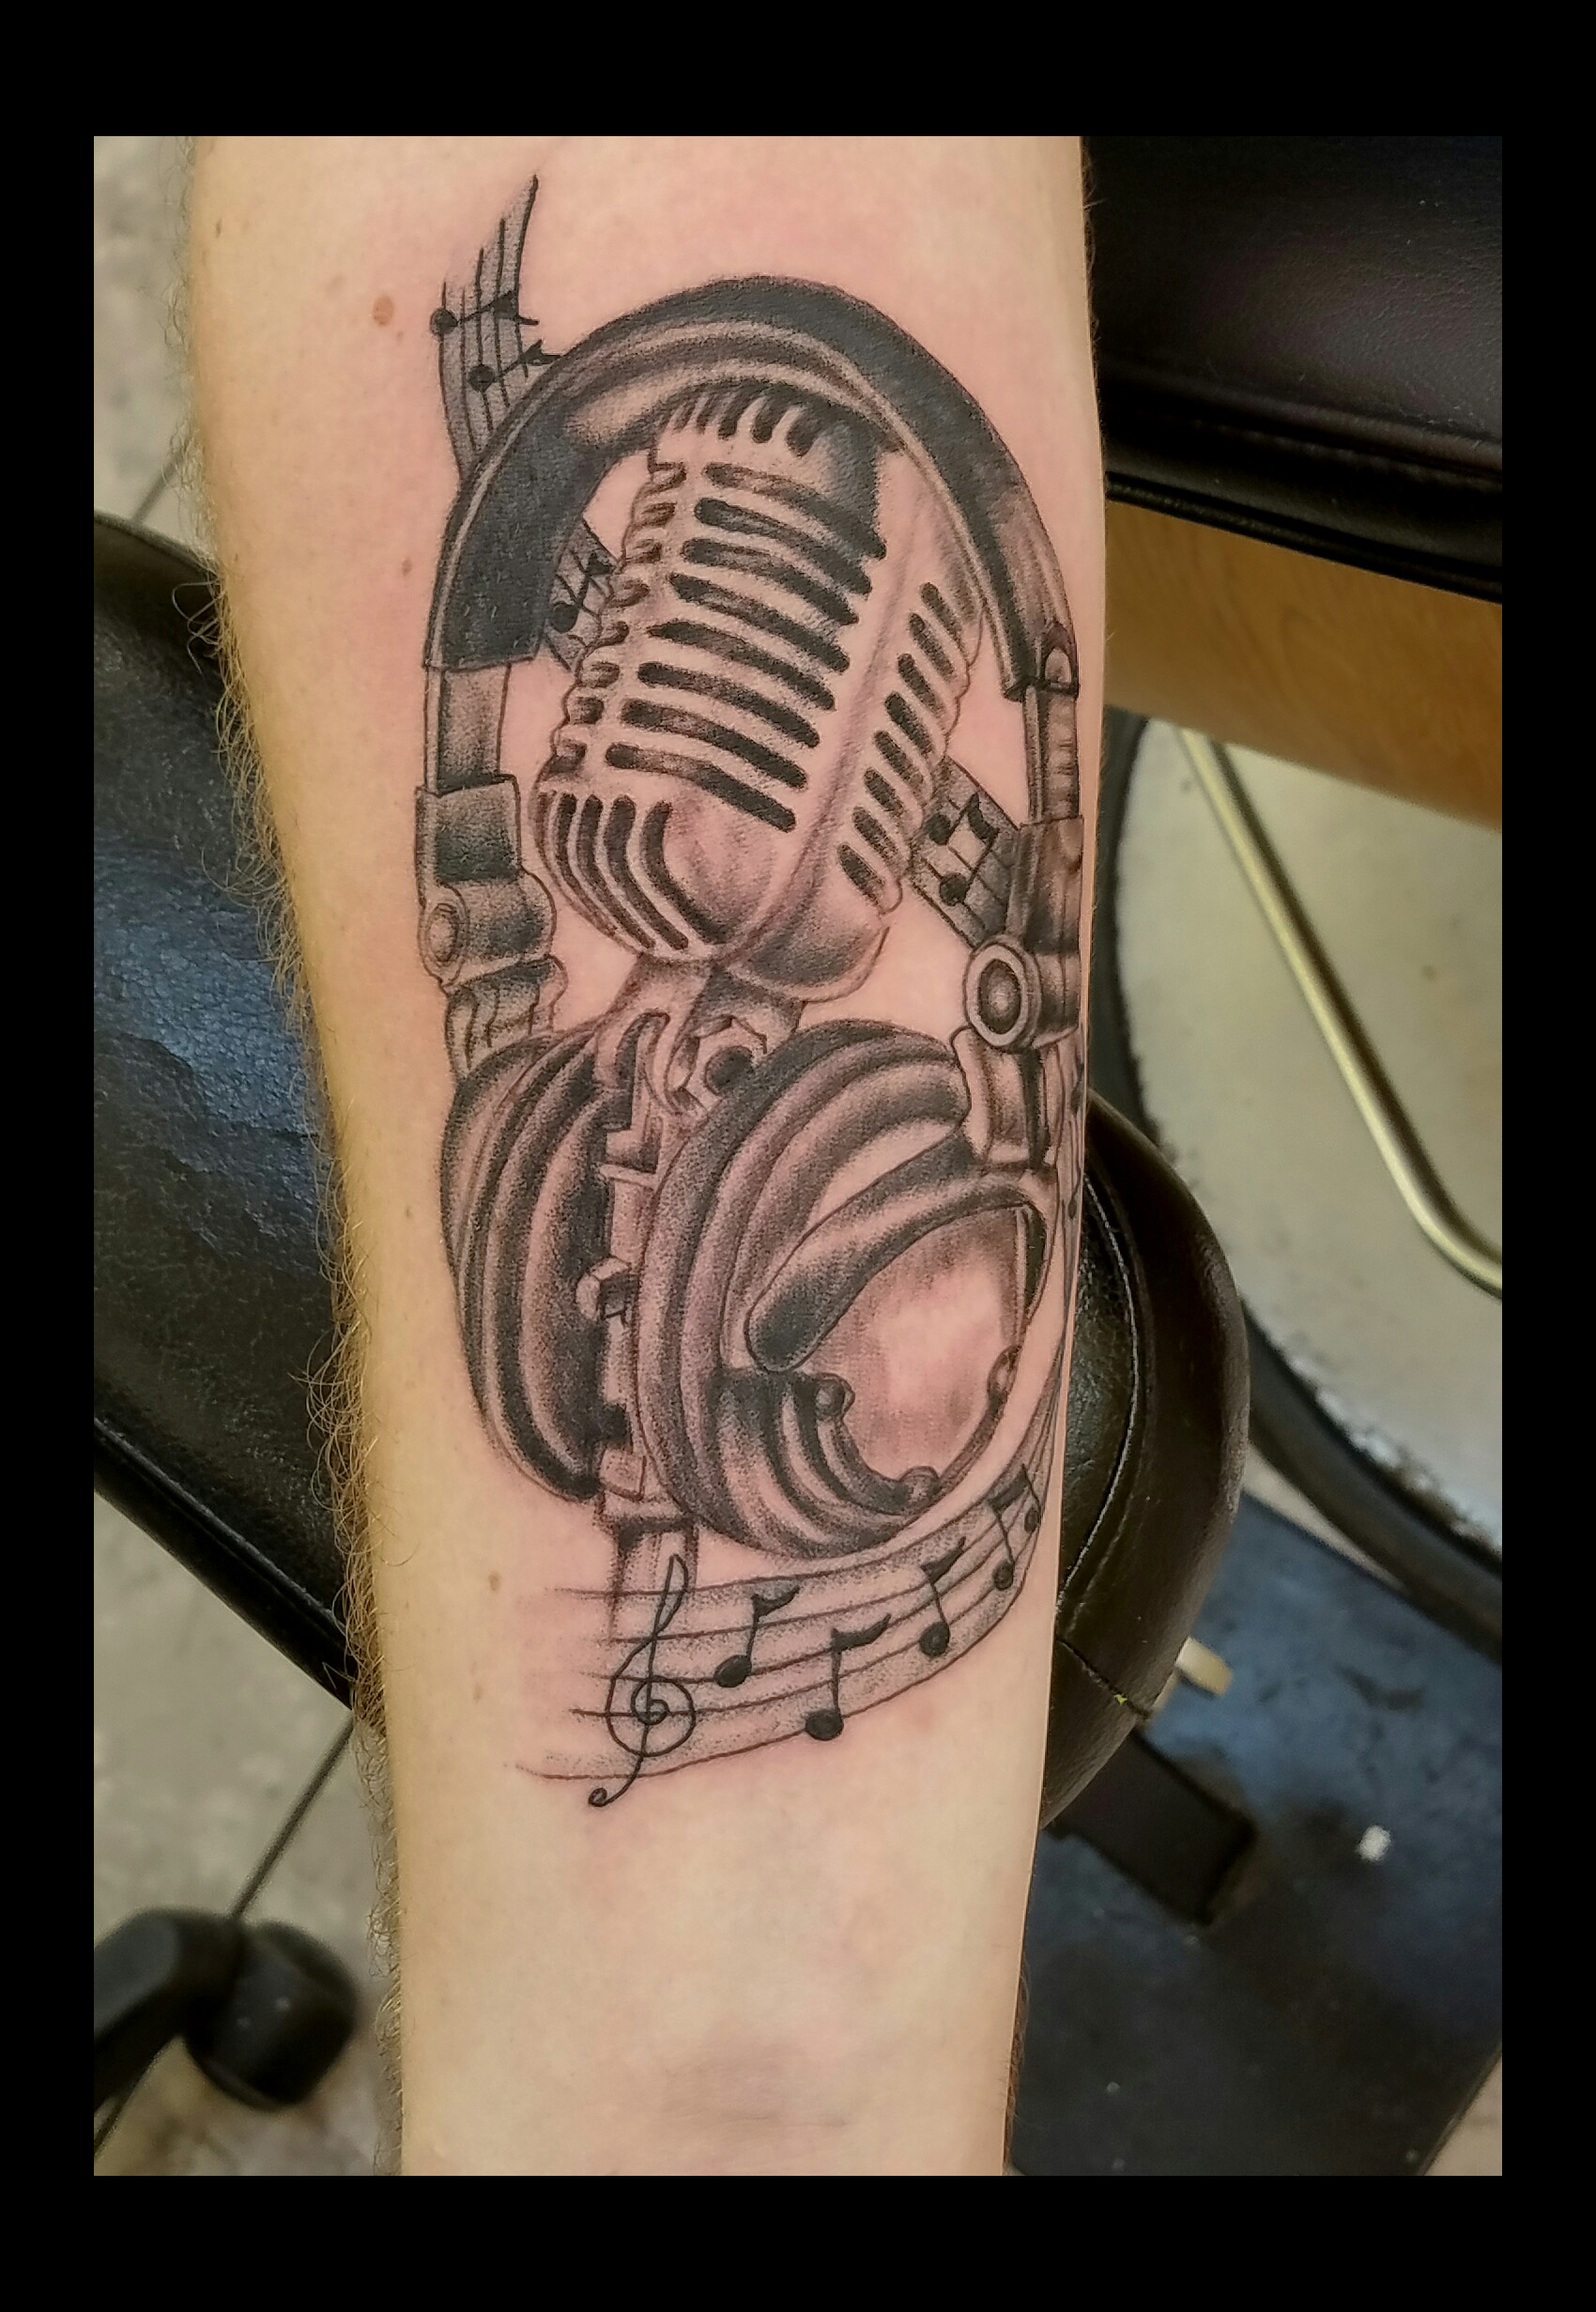 Microphon Head phones tattoo by Ruben